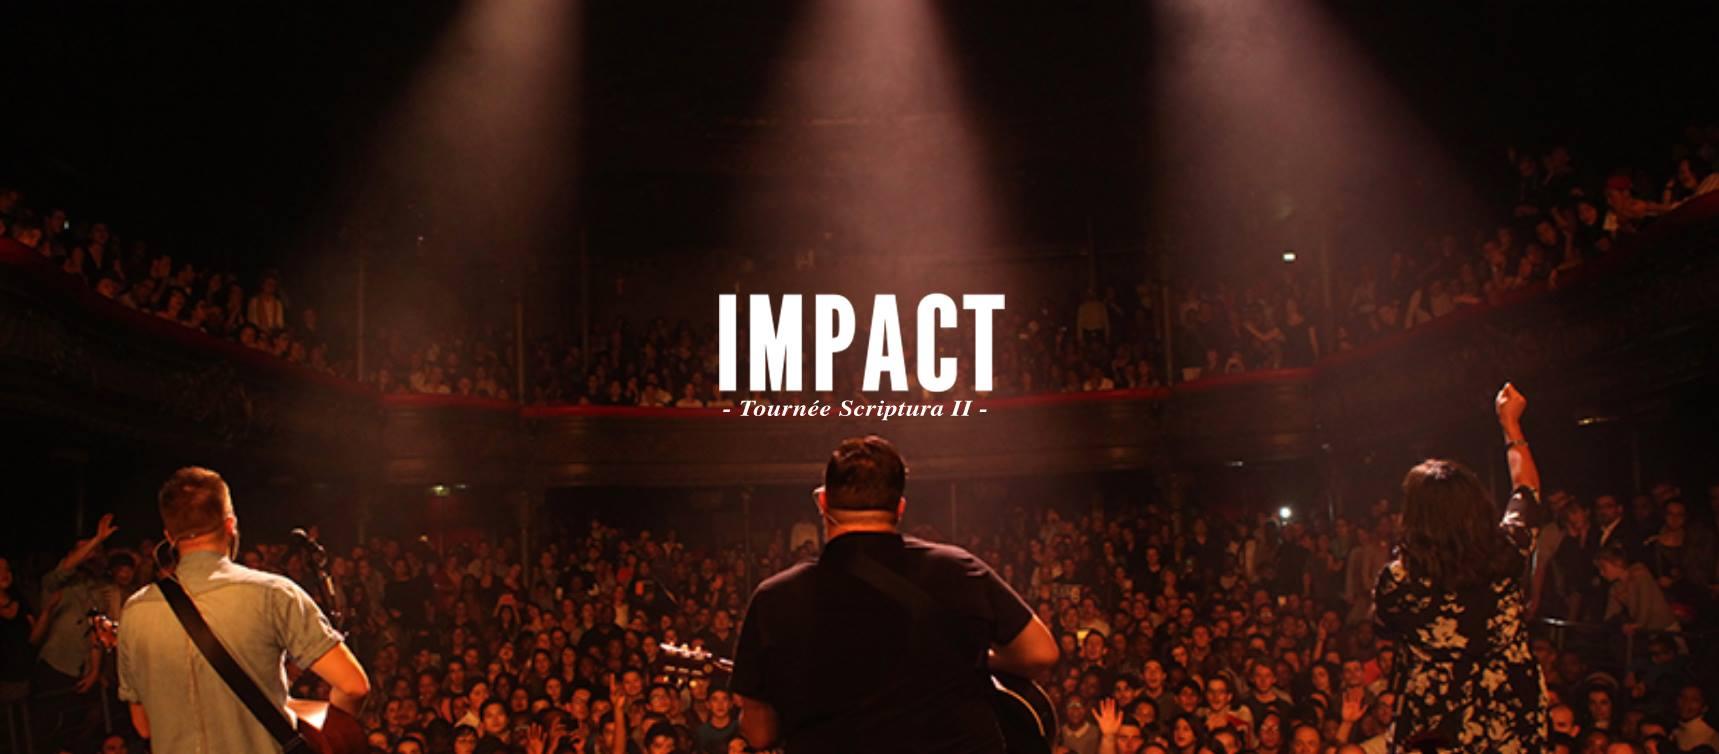 Groupe Impact